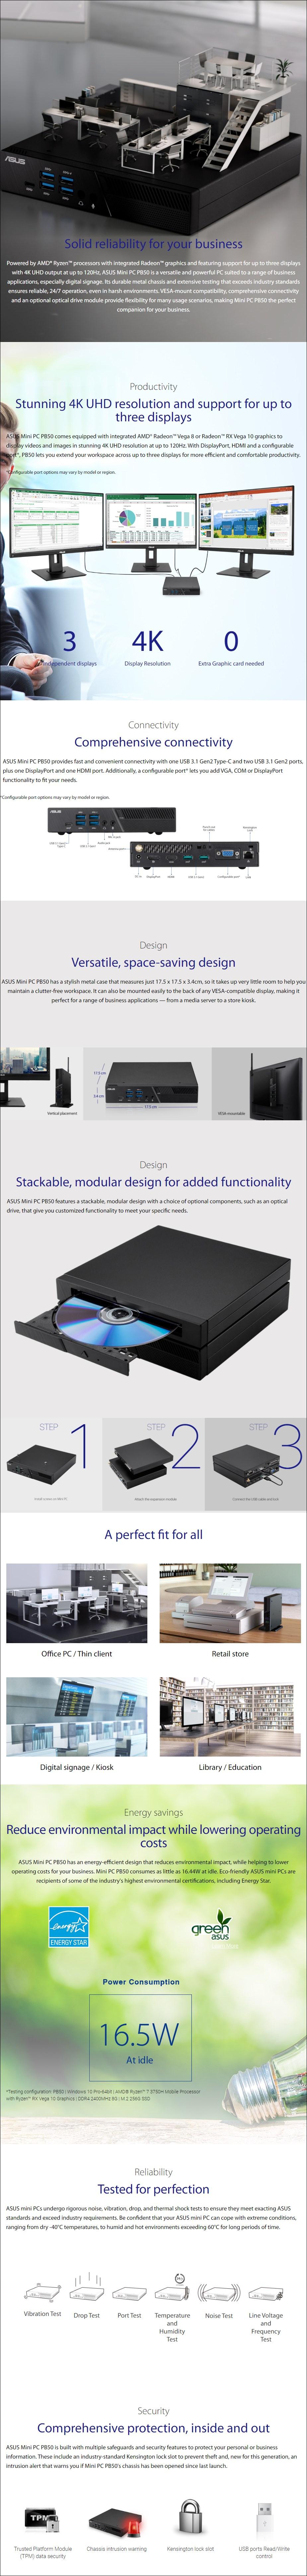 ASUS VivoMini PB50 Barebone Kit - AMD Ryzen 7 3750H - Overview 1